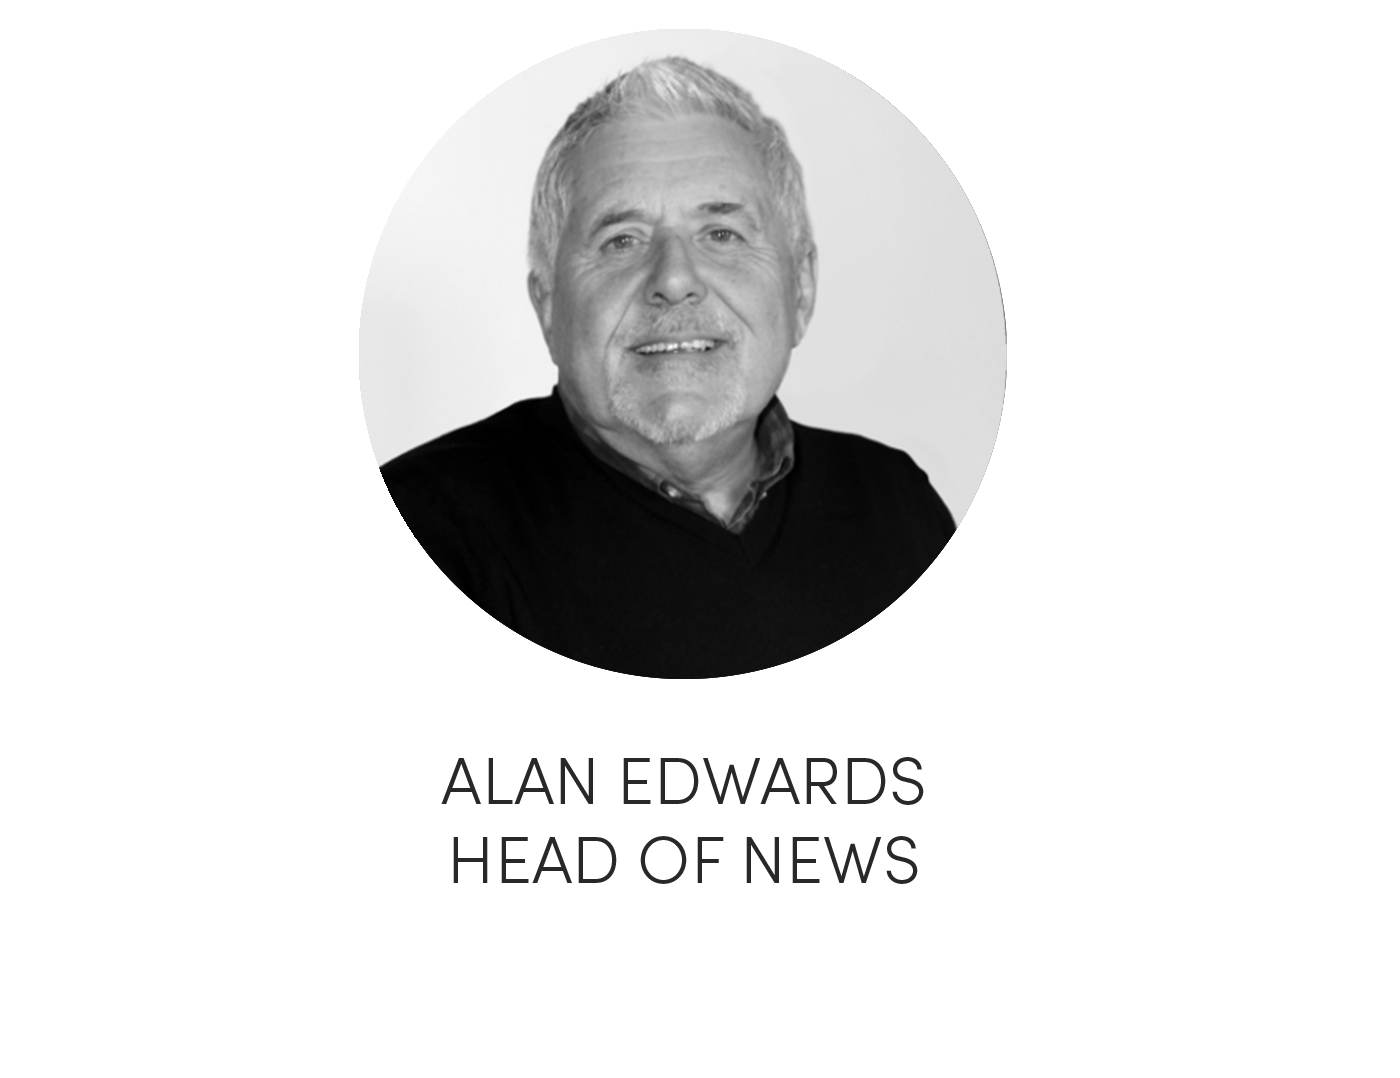 Alan Edwards Head of News